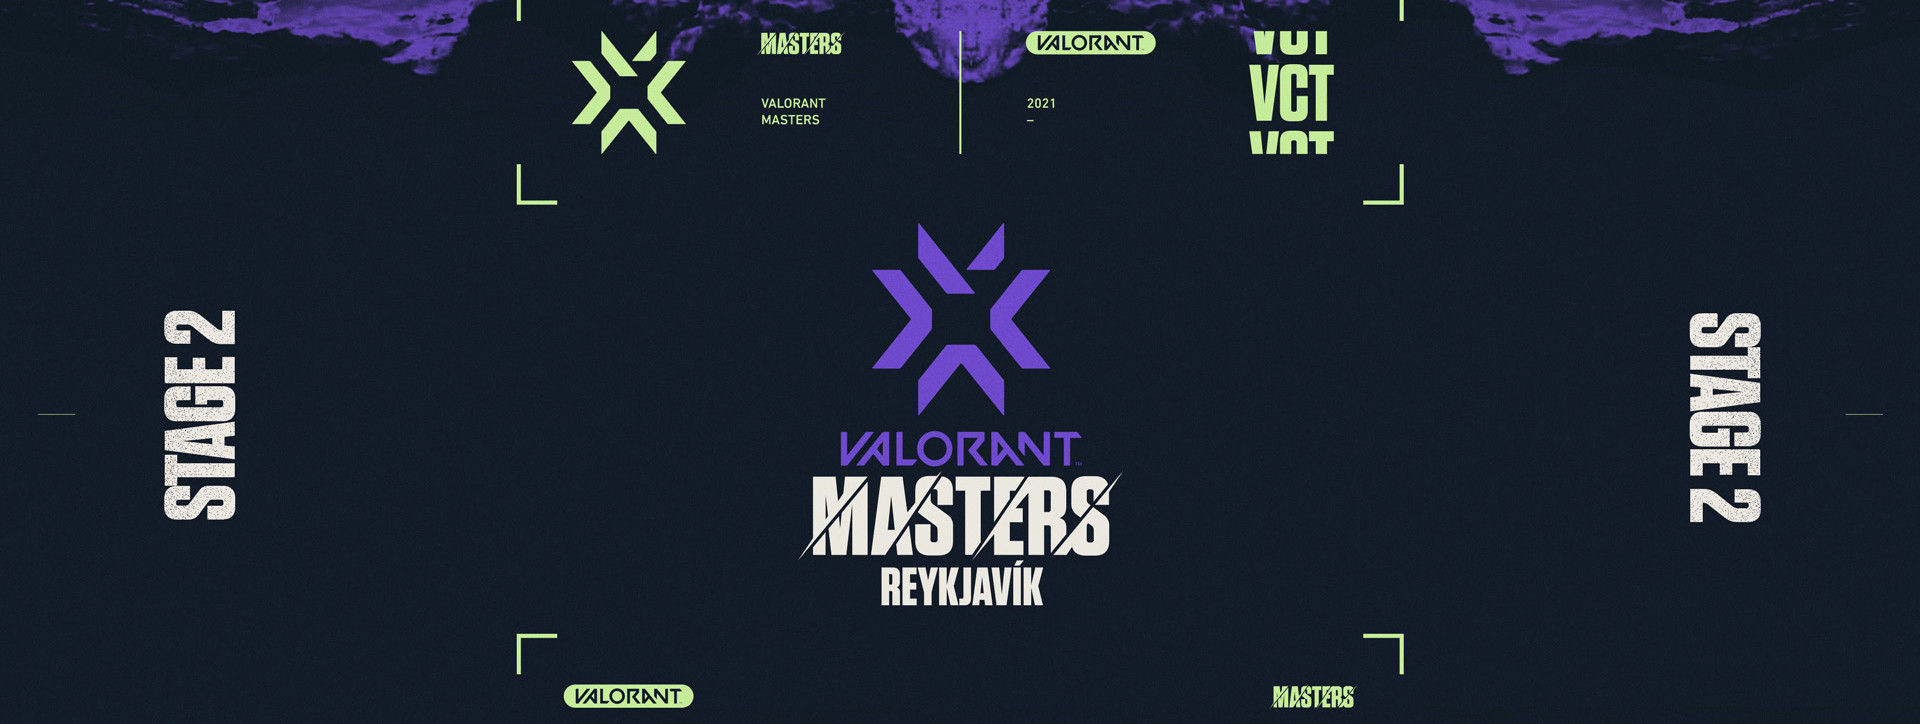 Masters 2 in Reykjavík: Wave-Profi murii freut sich auf Korea